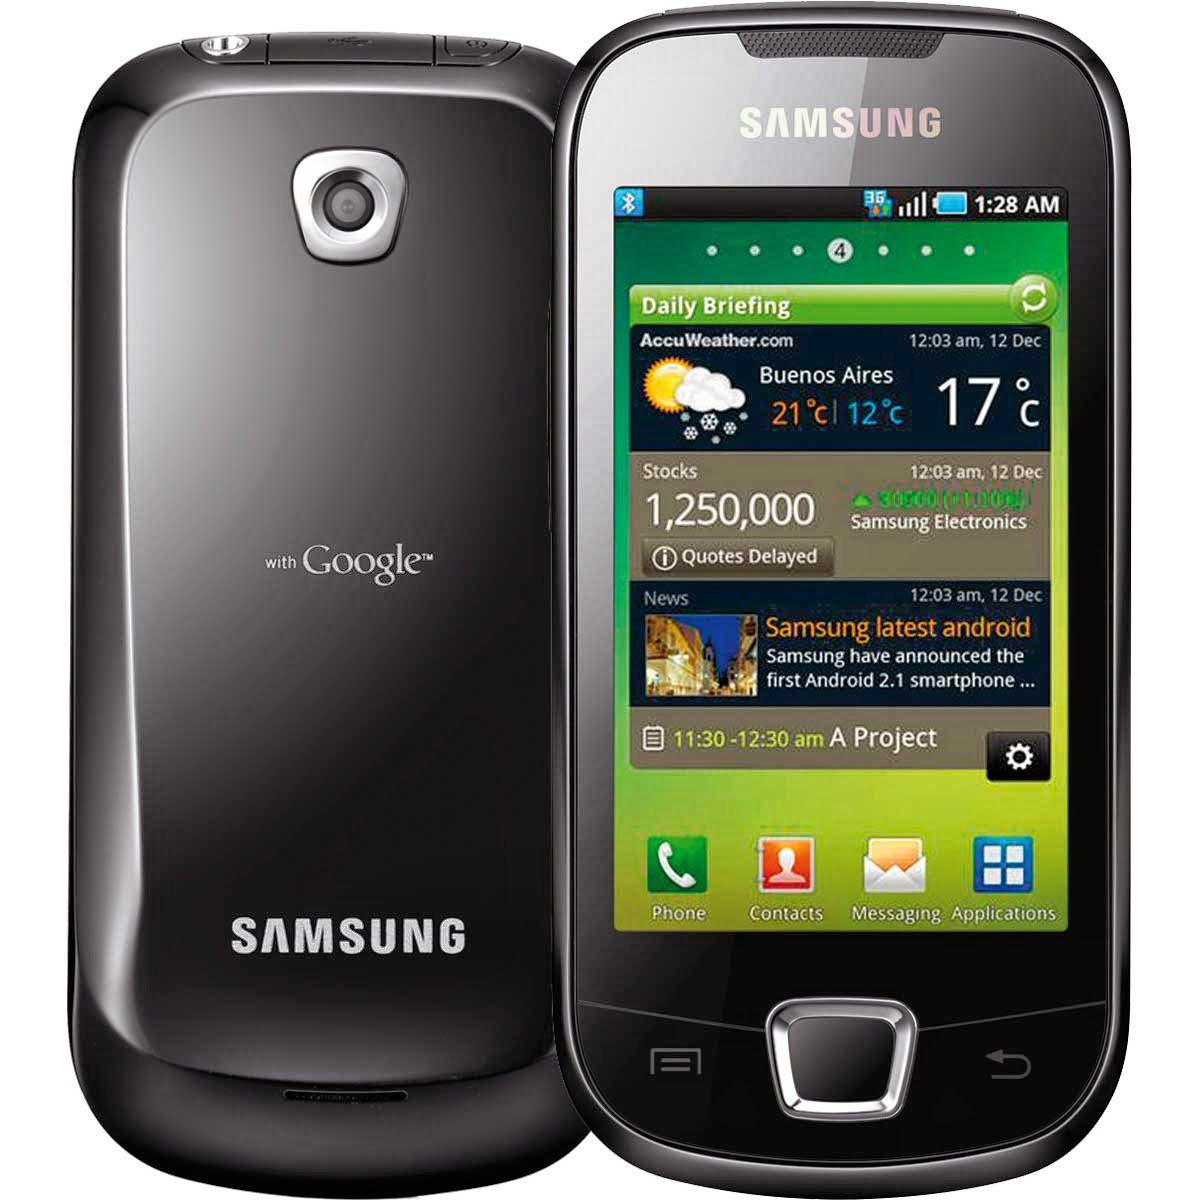 Samsung I5800 Galaxy 3 Firmware